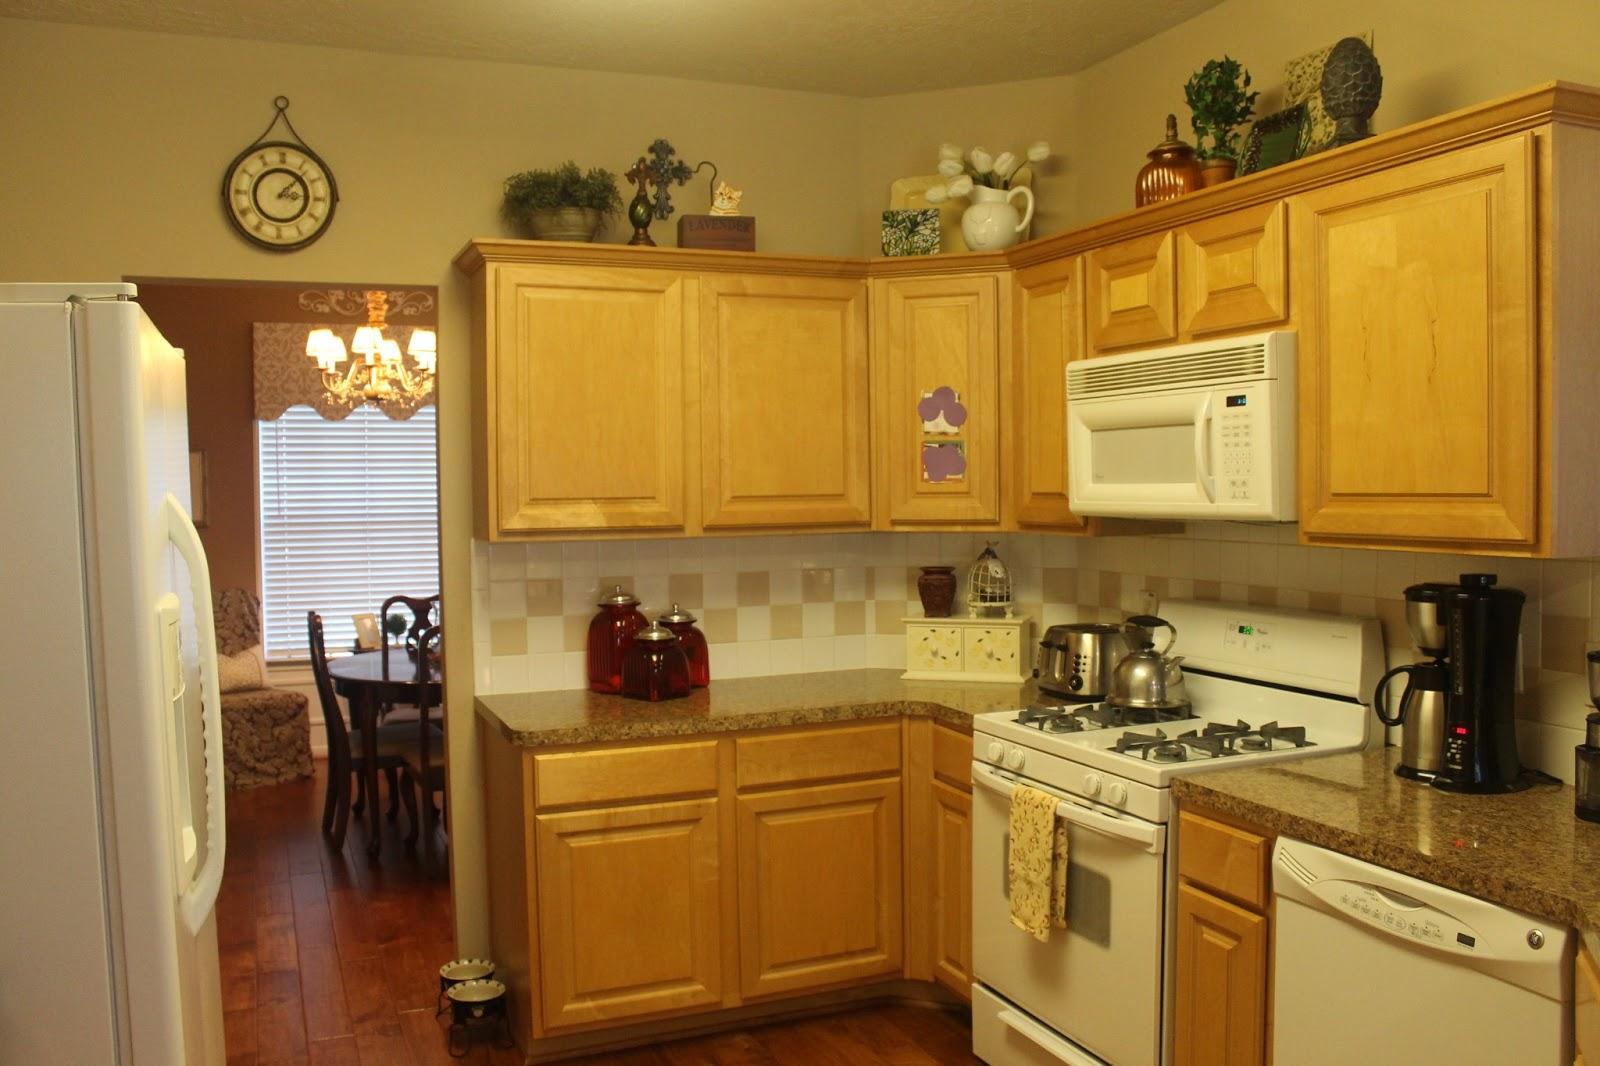 Http Texasdecor Blogspot Com 2013 03 The Kitchen Html